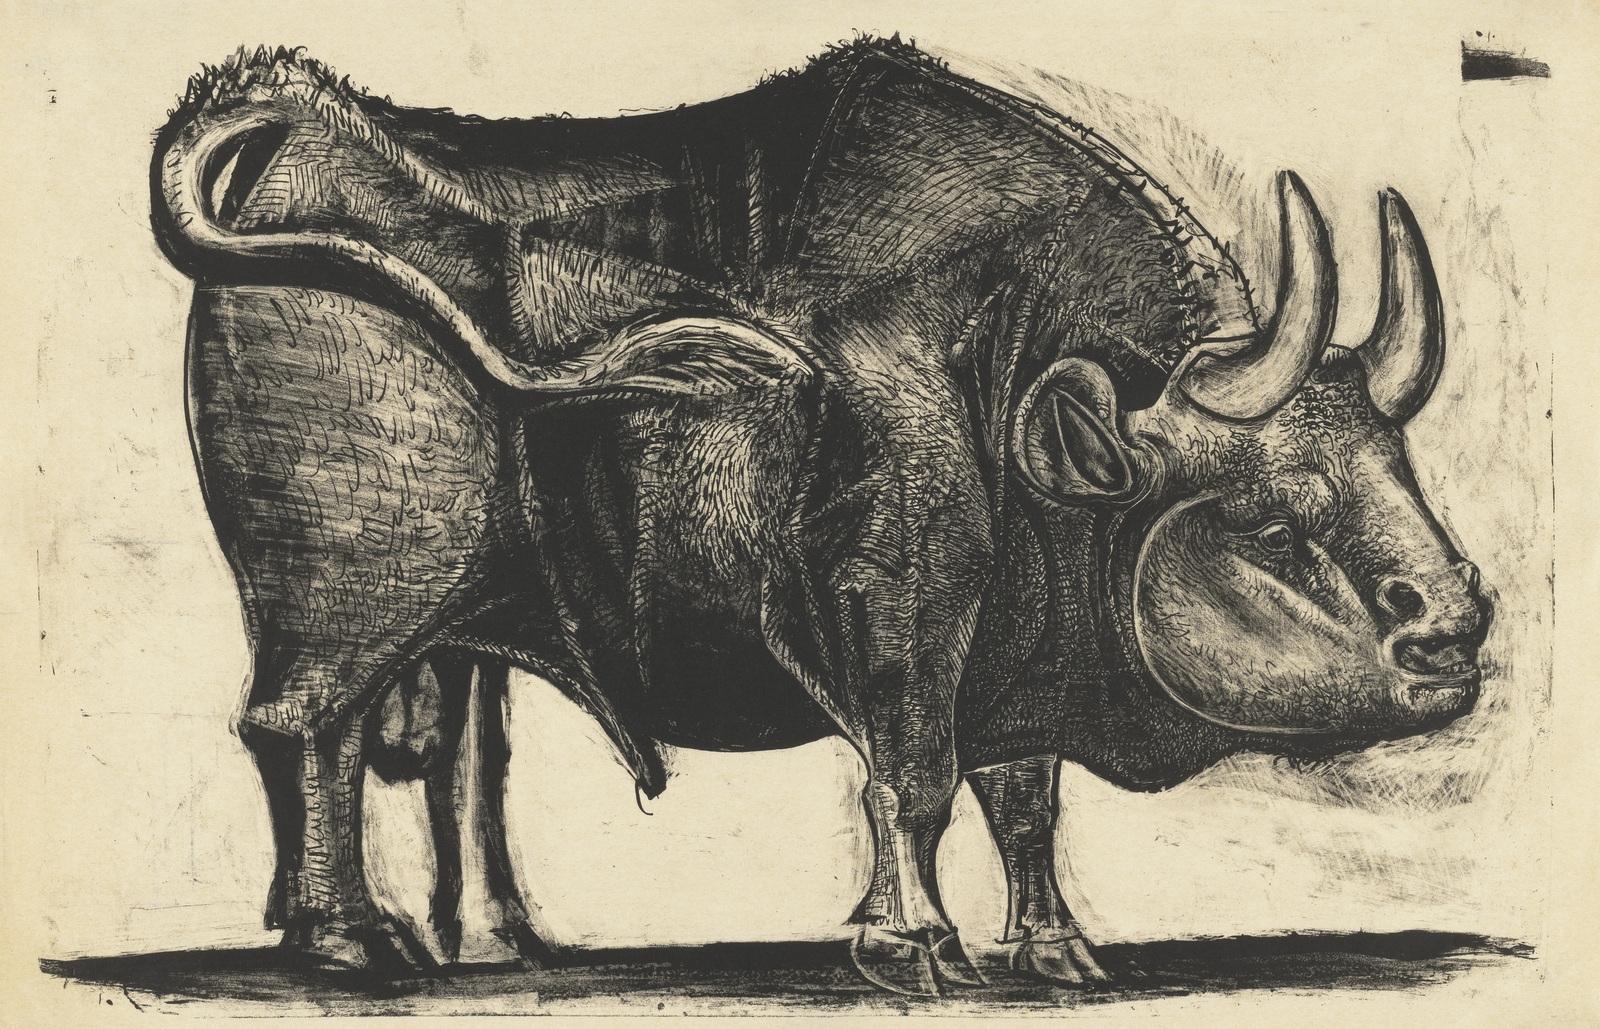 Bull, state IV, 1945 image